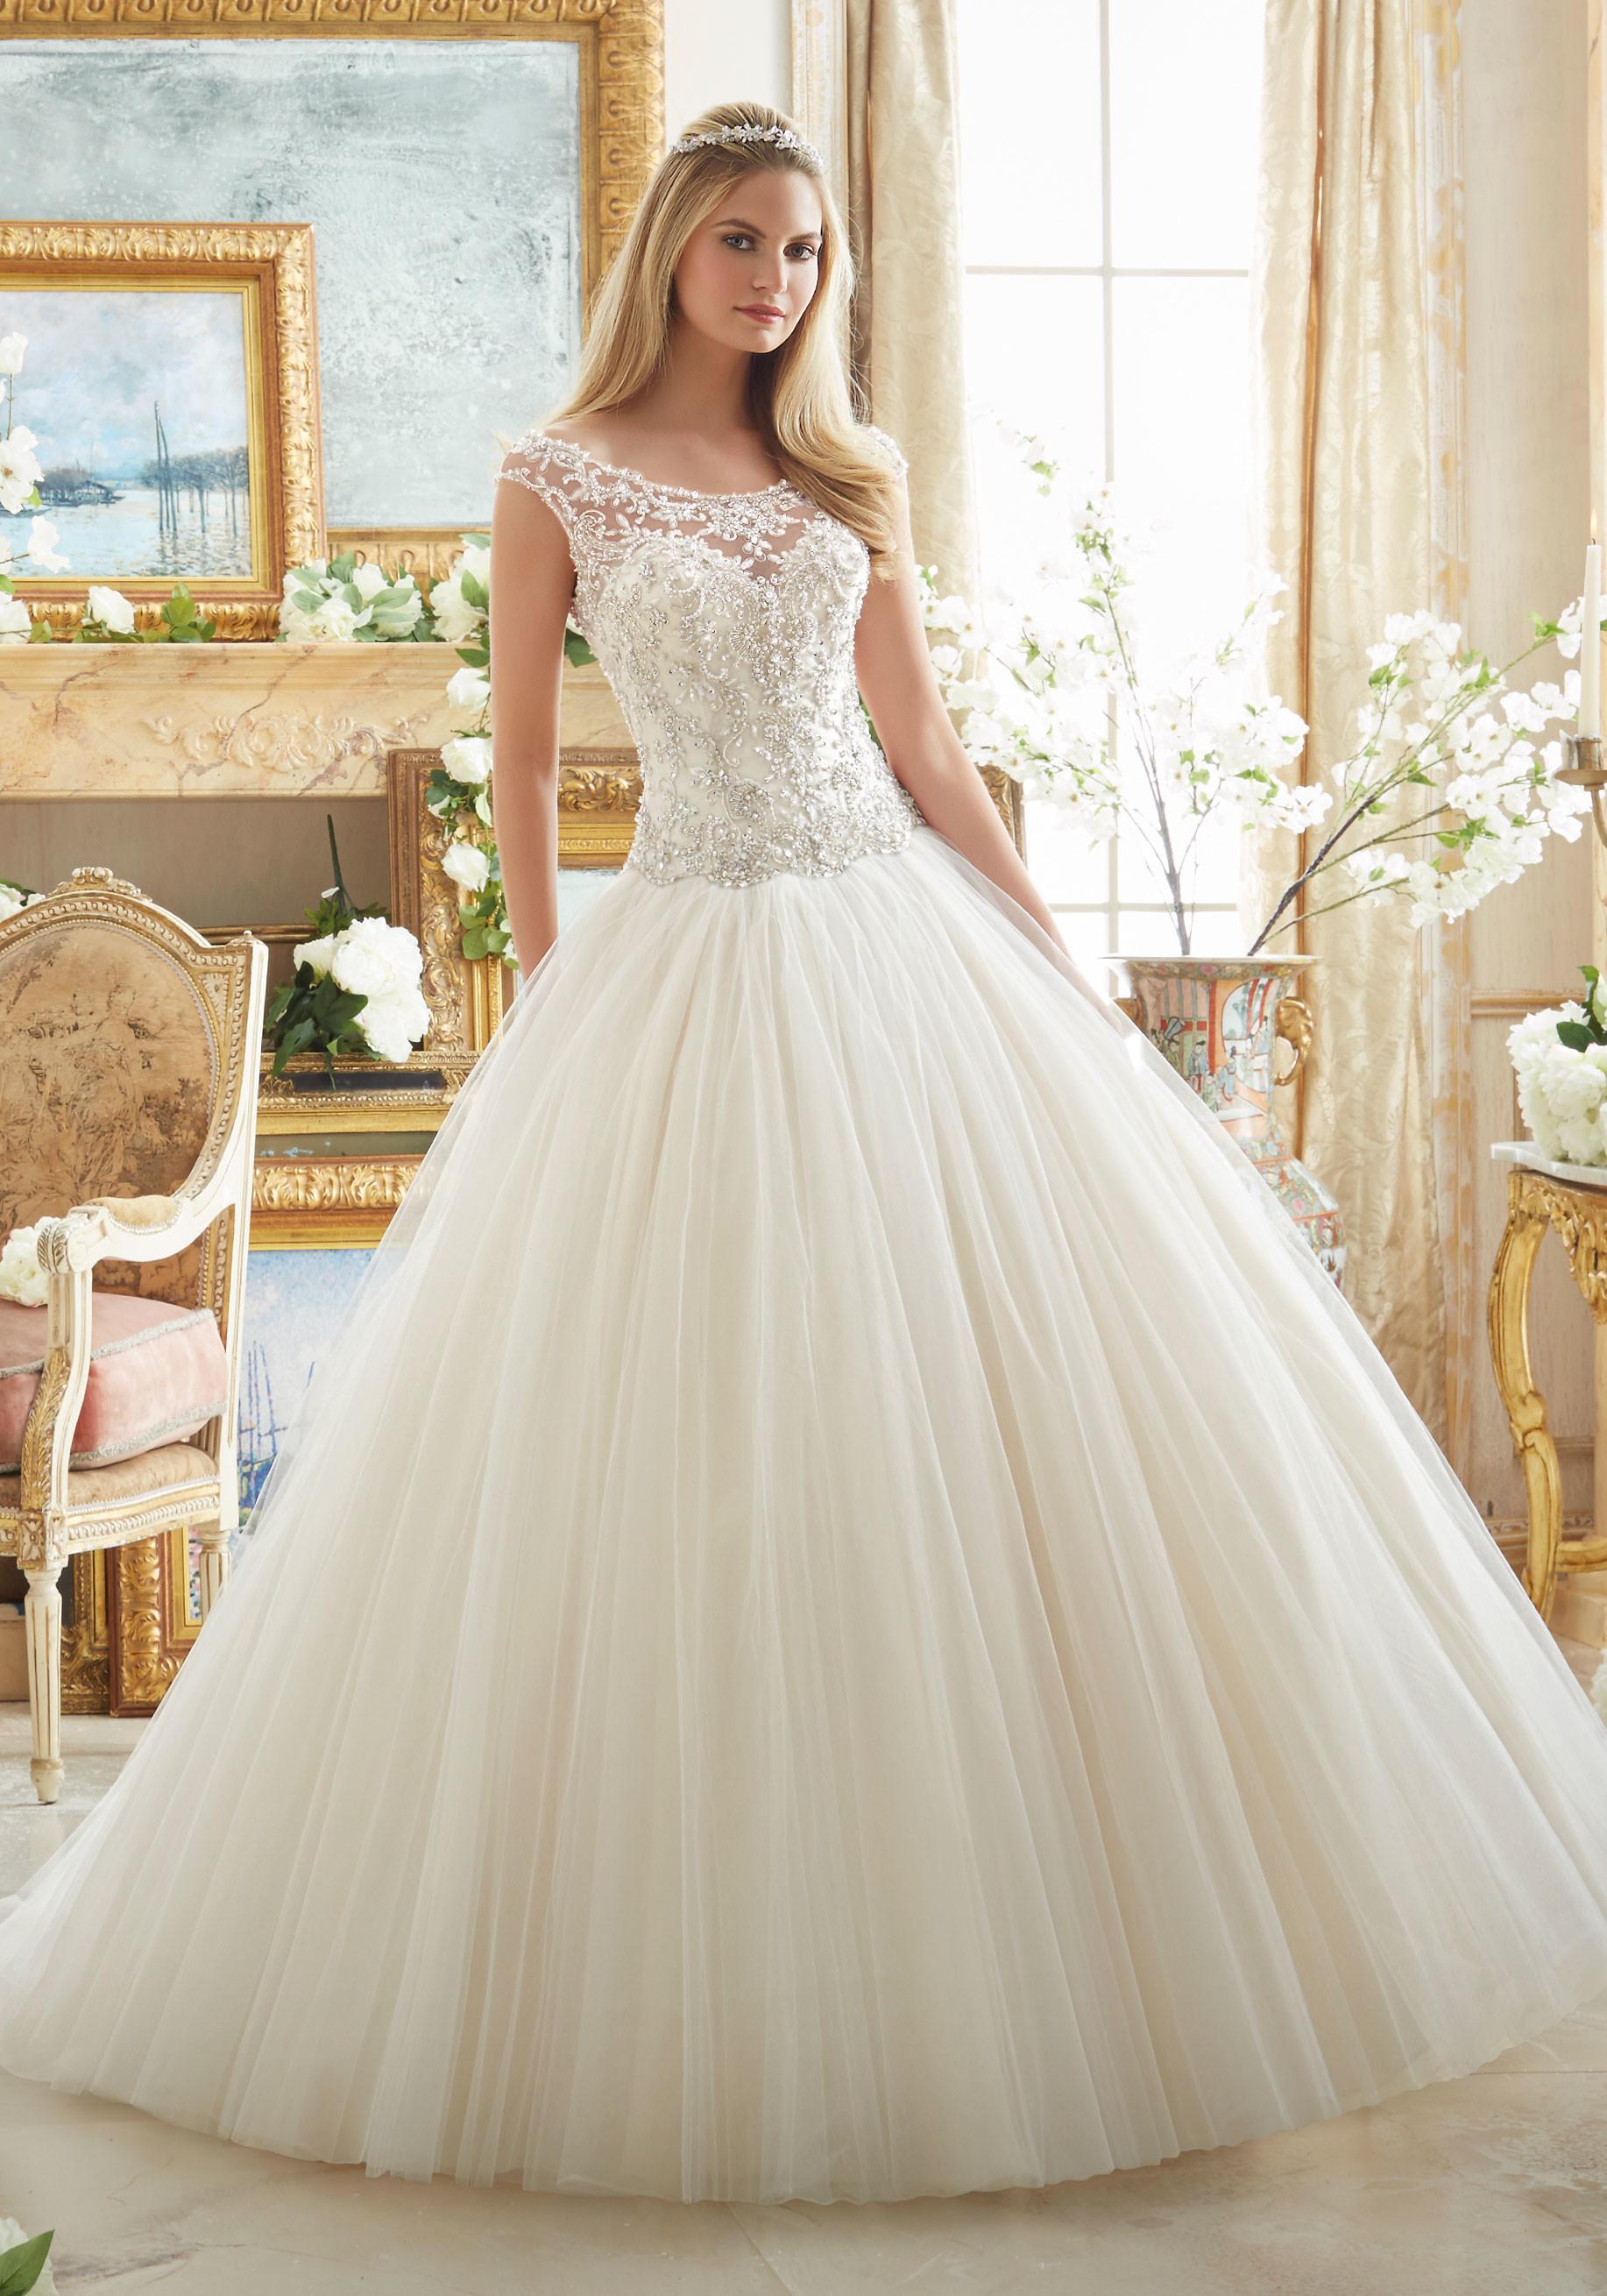 9 Wedding Dress Wallpapers On Wallpaperplay   9x290 ...